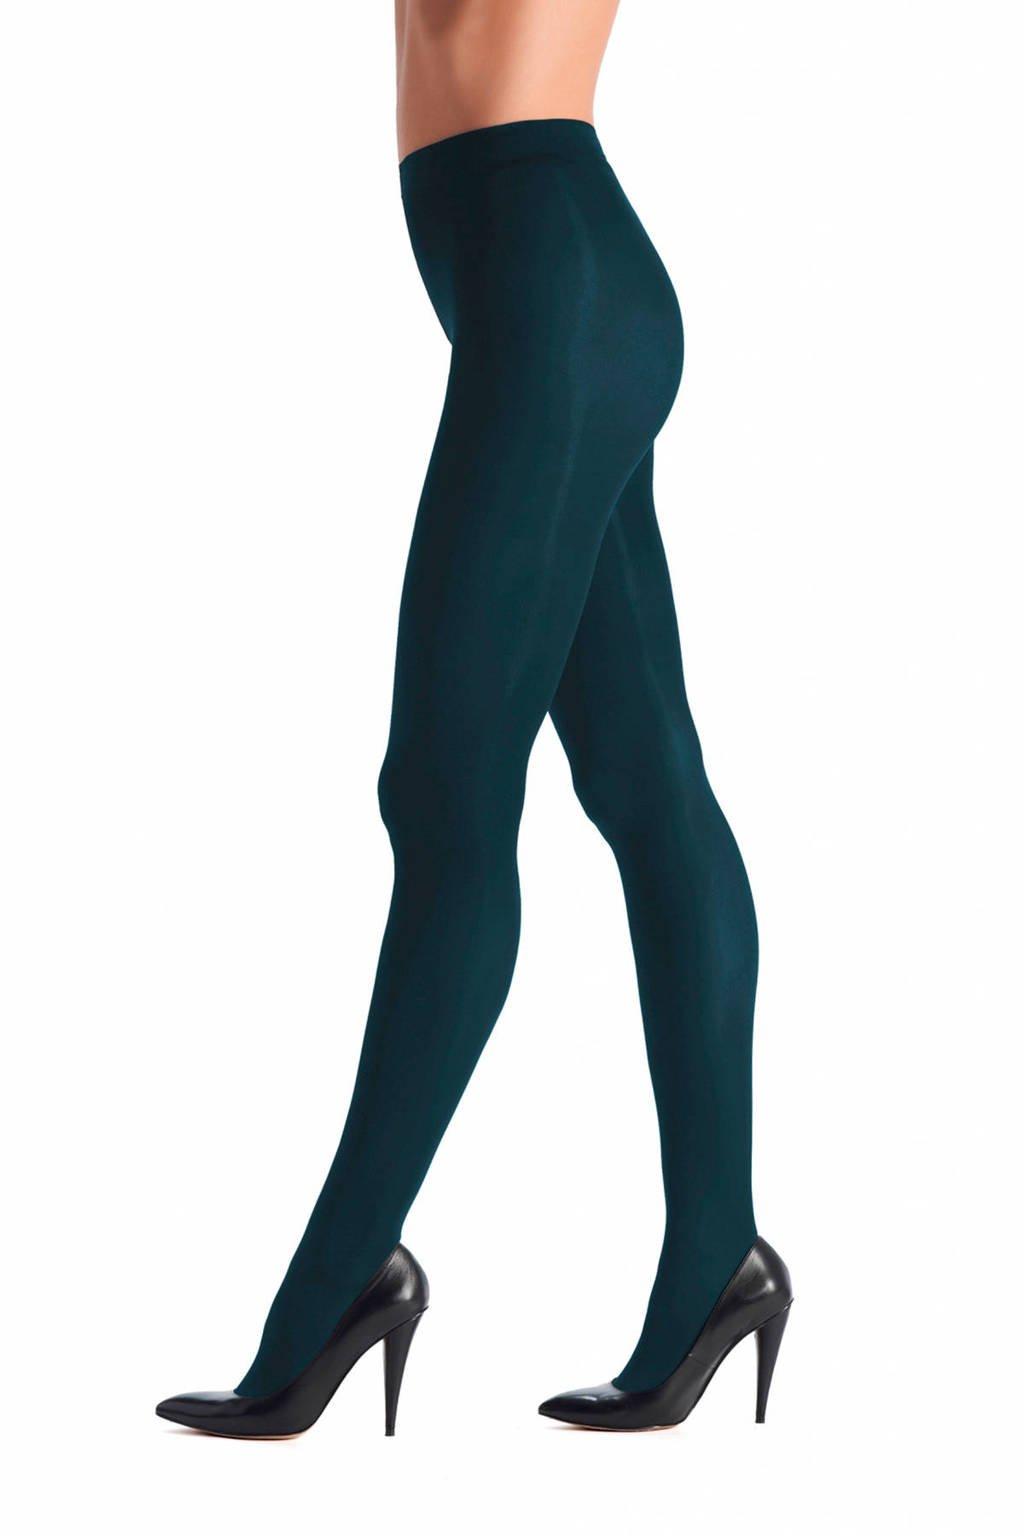 Oroblu panty 50 den blauw, Blauw